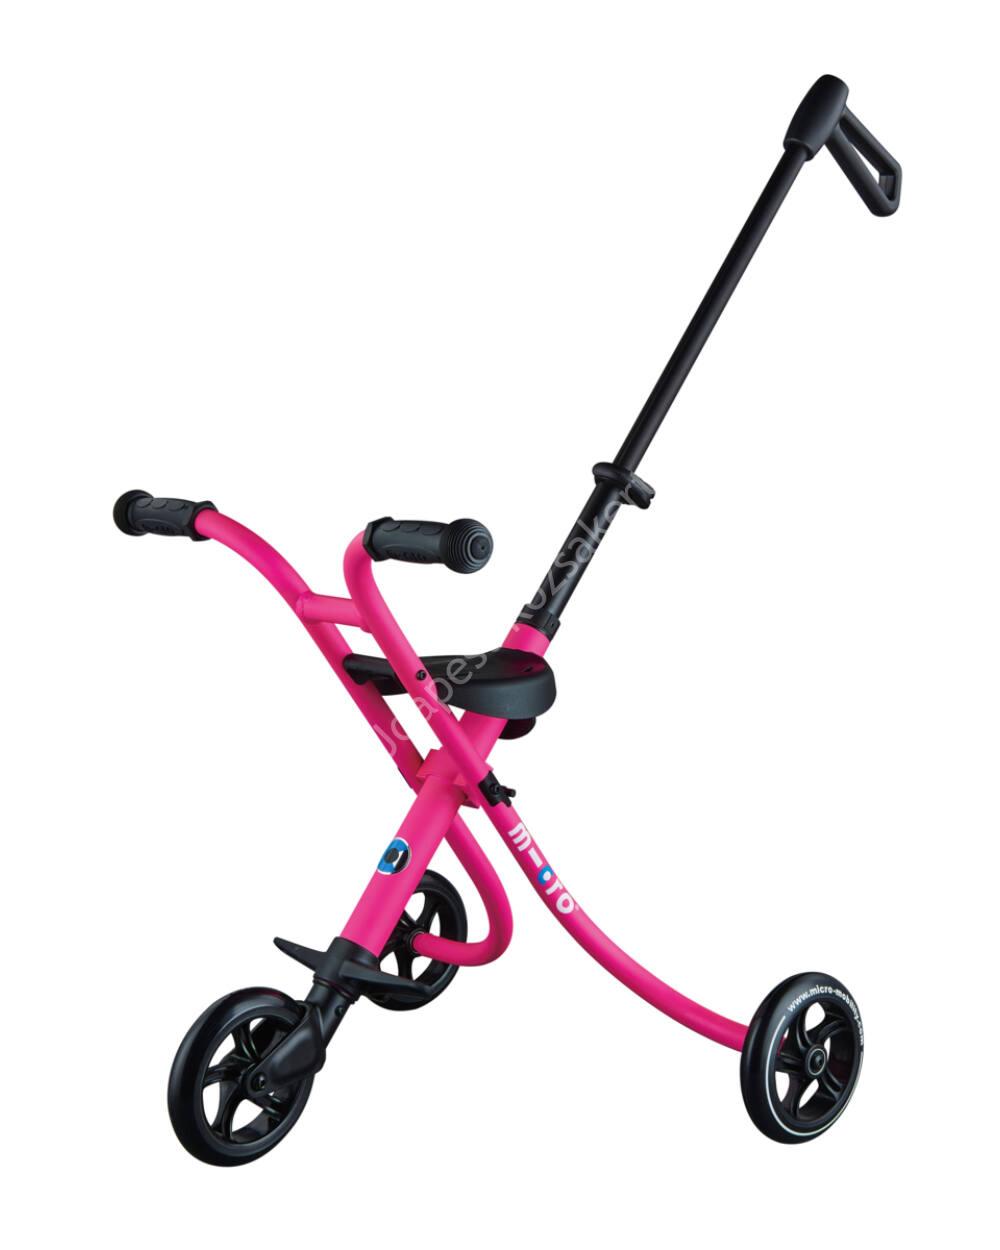 Micro Trike XL háromkerekű, tologatható tricikli, shocking pink